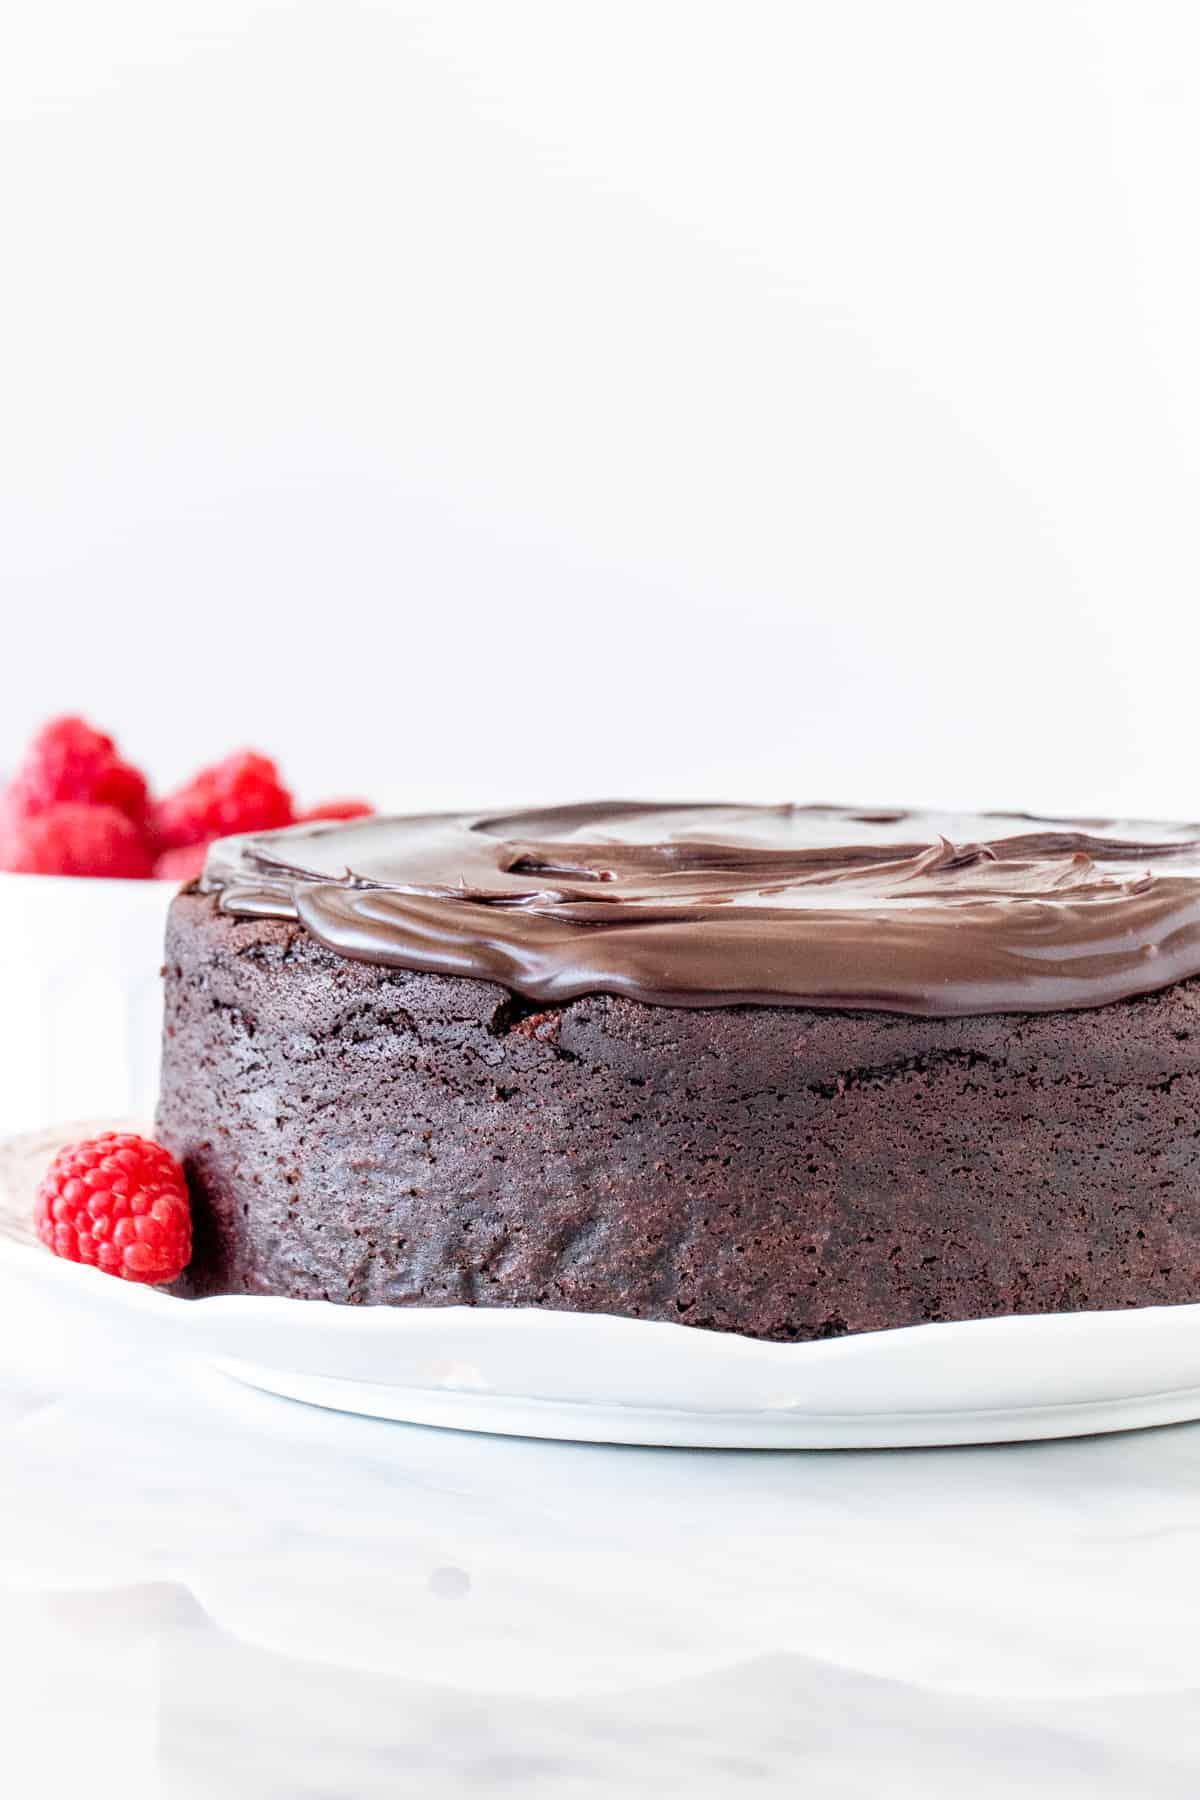 Single layer chocolate cake with chocolate ganache on top